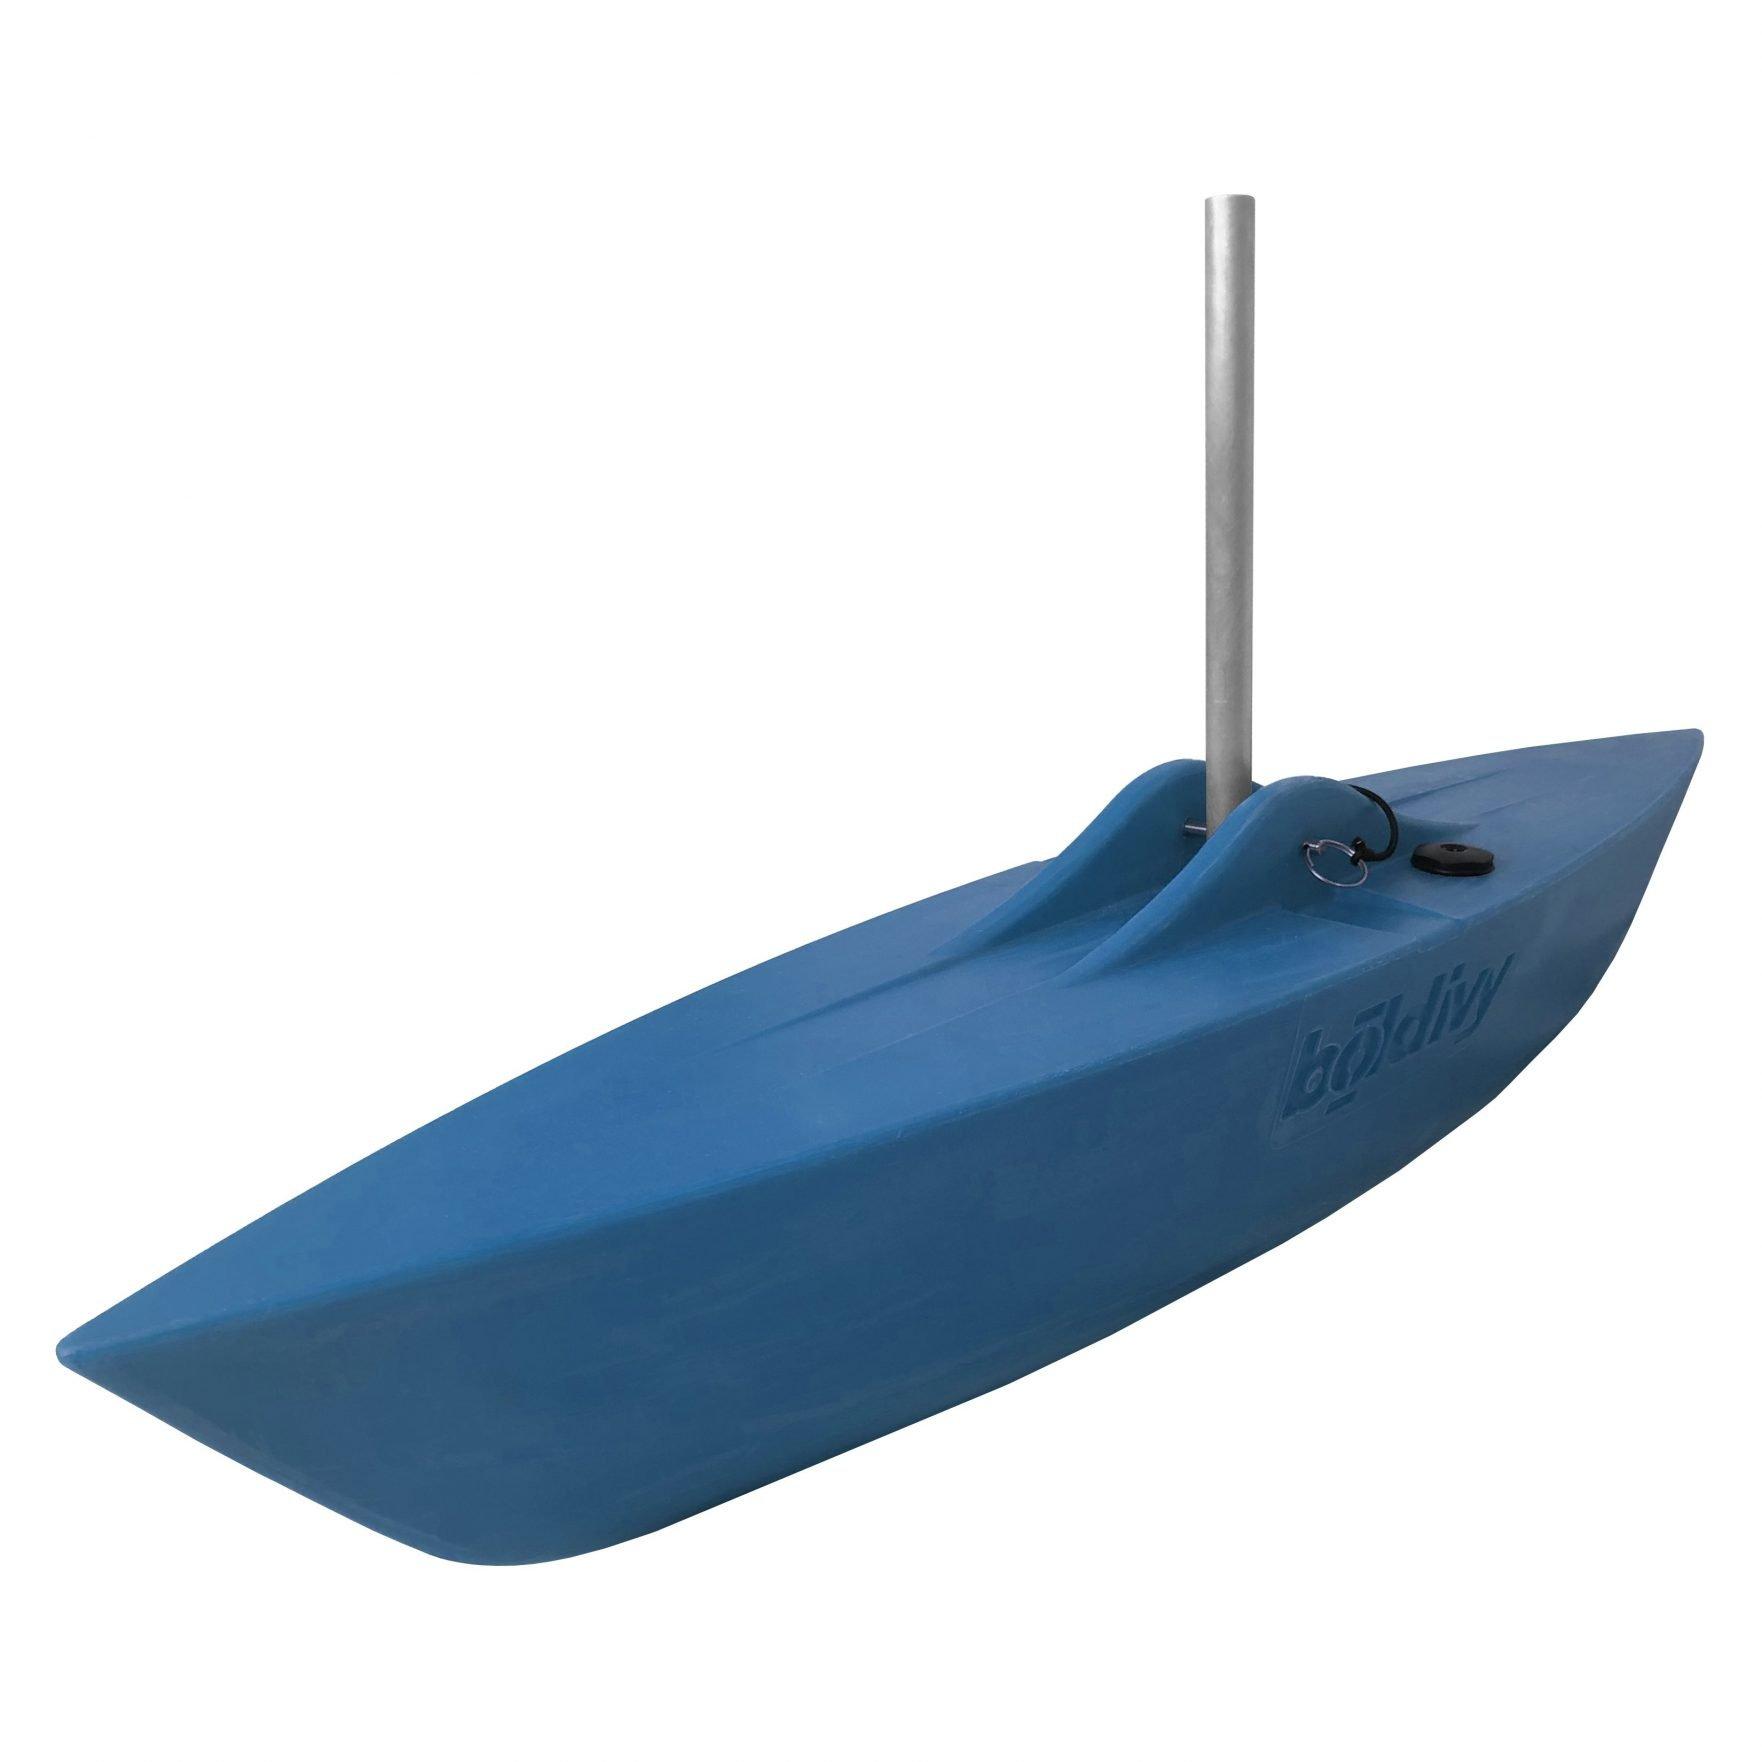 Bold Ivy Canoe Stabilizer Floats - Angle - Blue